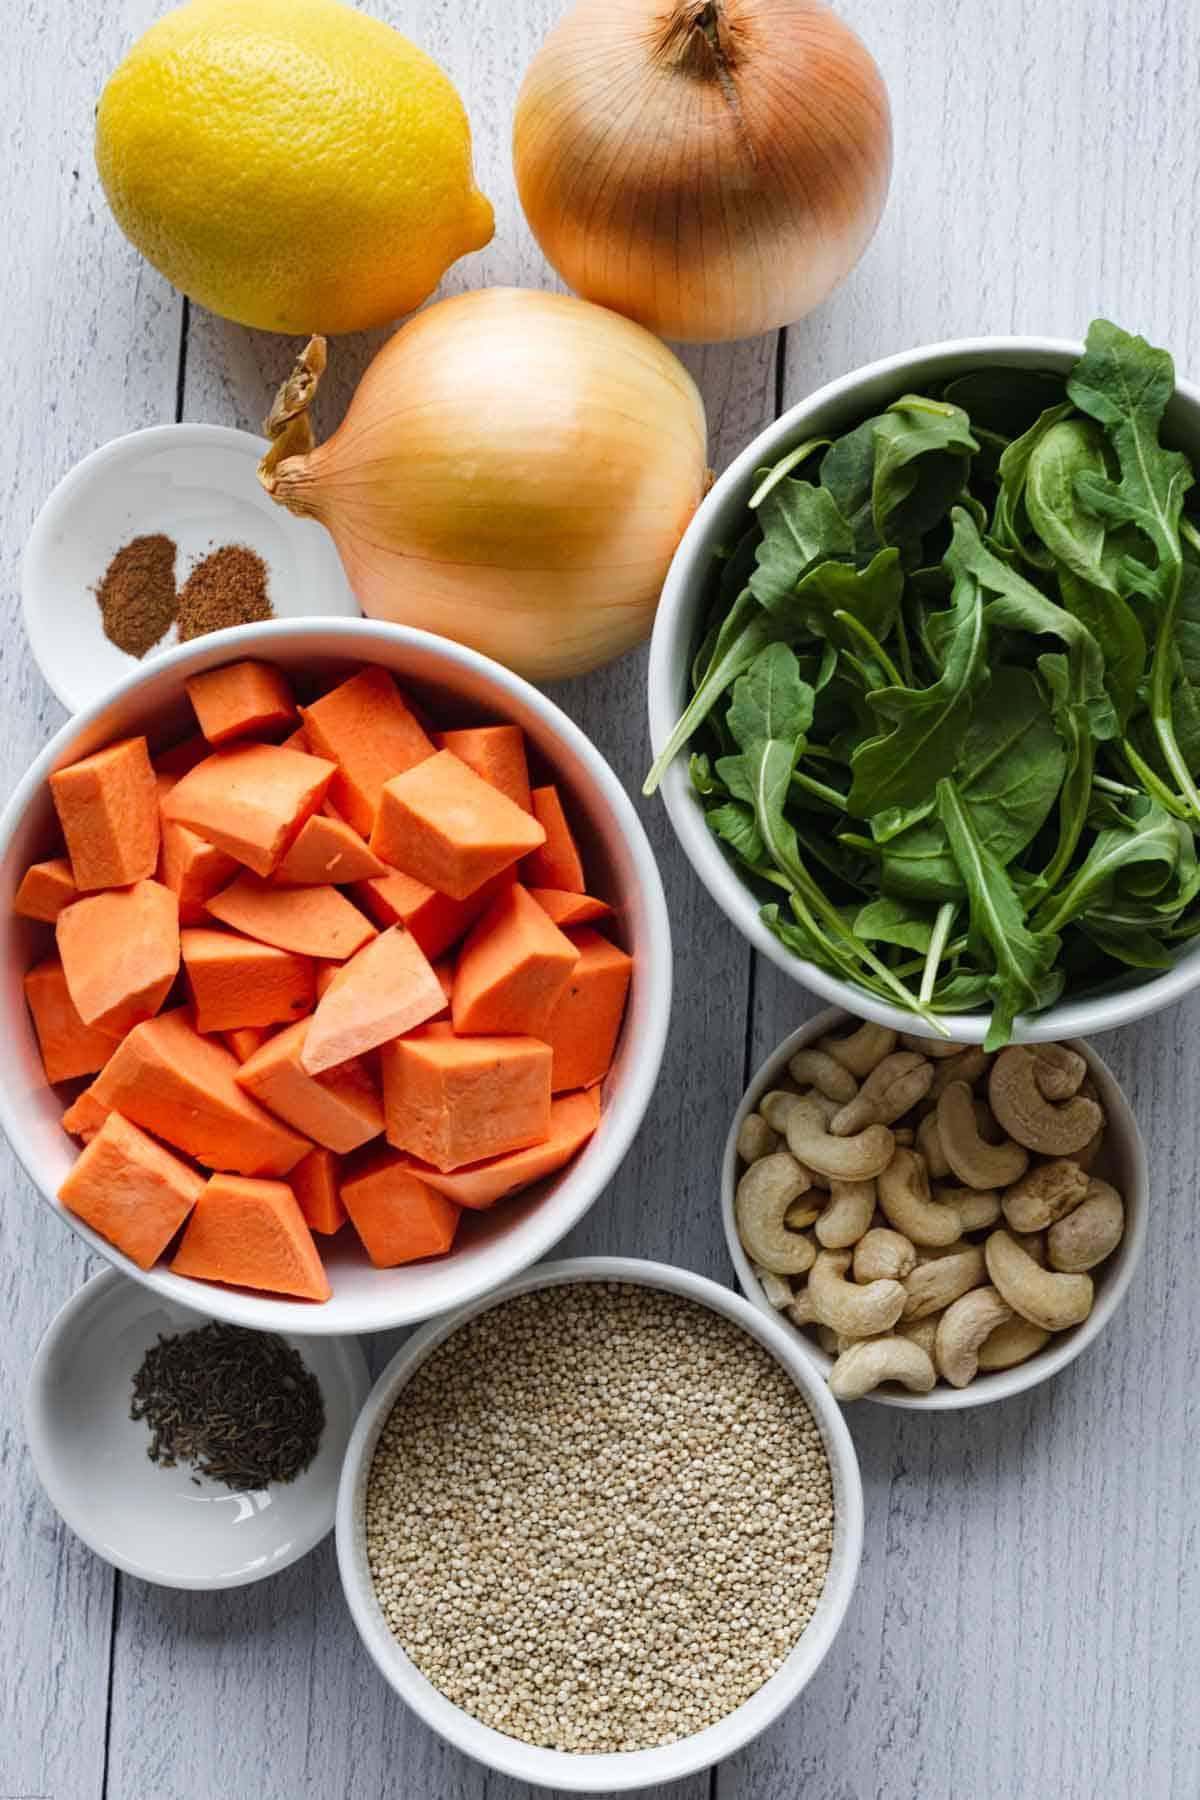 Ingredients for making Sweet Potato & Quinoa Salad with Tahini: onions, lemon, quinoa, cashews, dried thyme, ground cinnamon, ground nutmeg, sweet potato, and arugula.